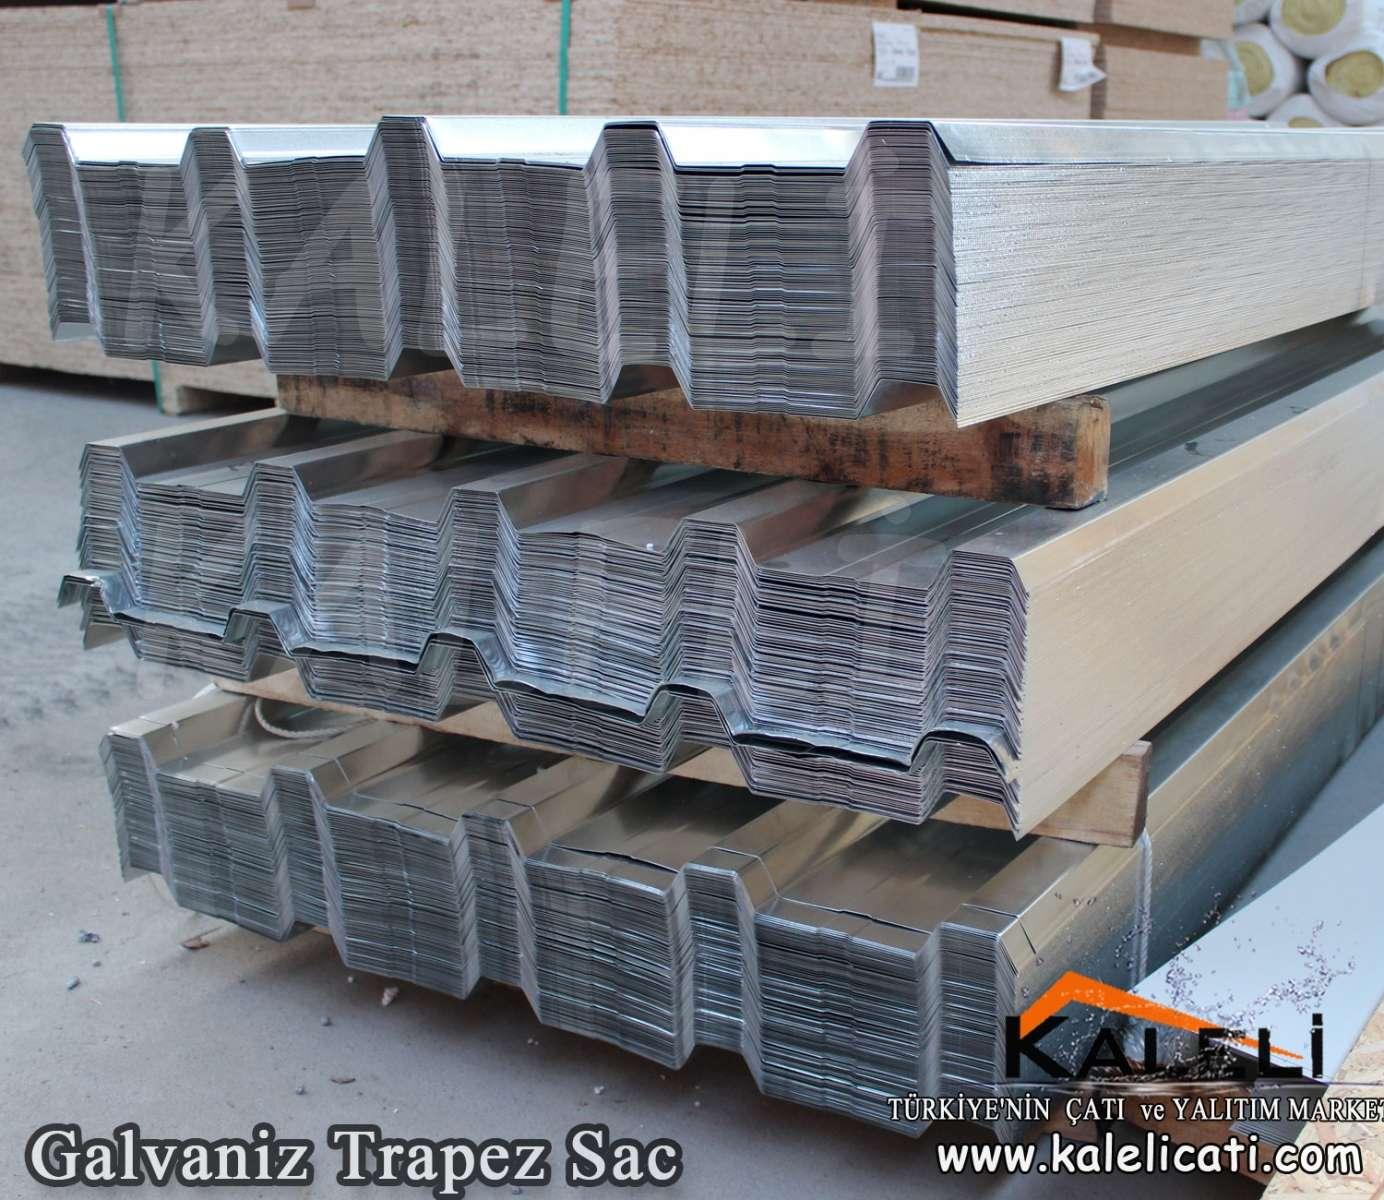 Galvaniz Trapez sac 87 cm 0,50 mm